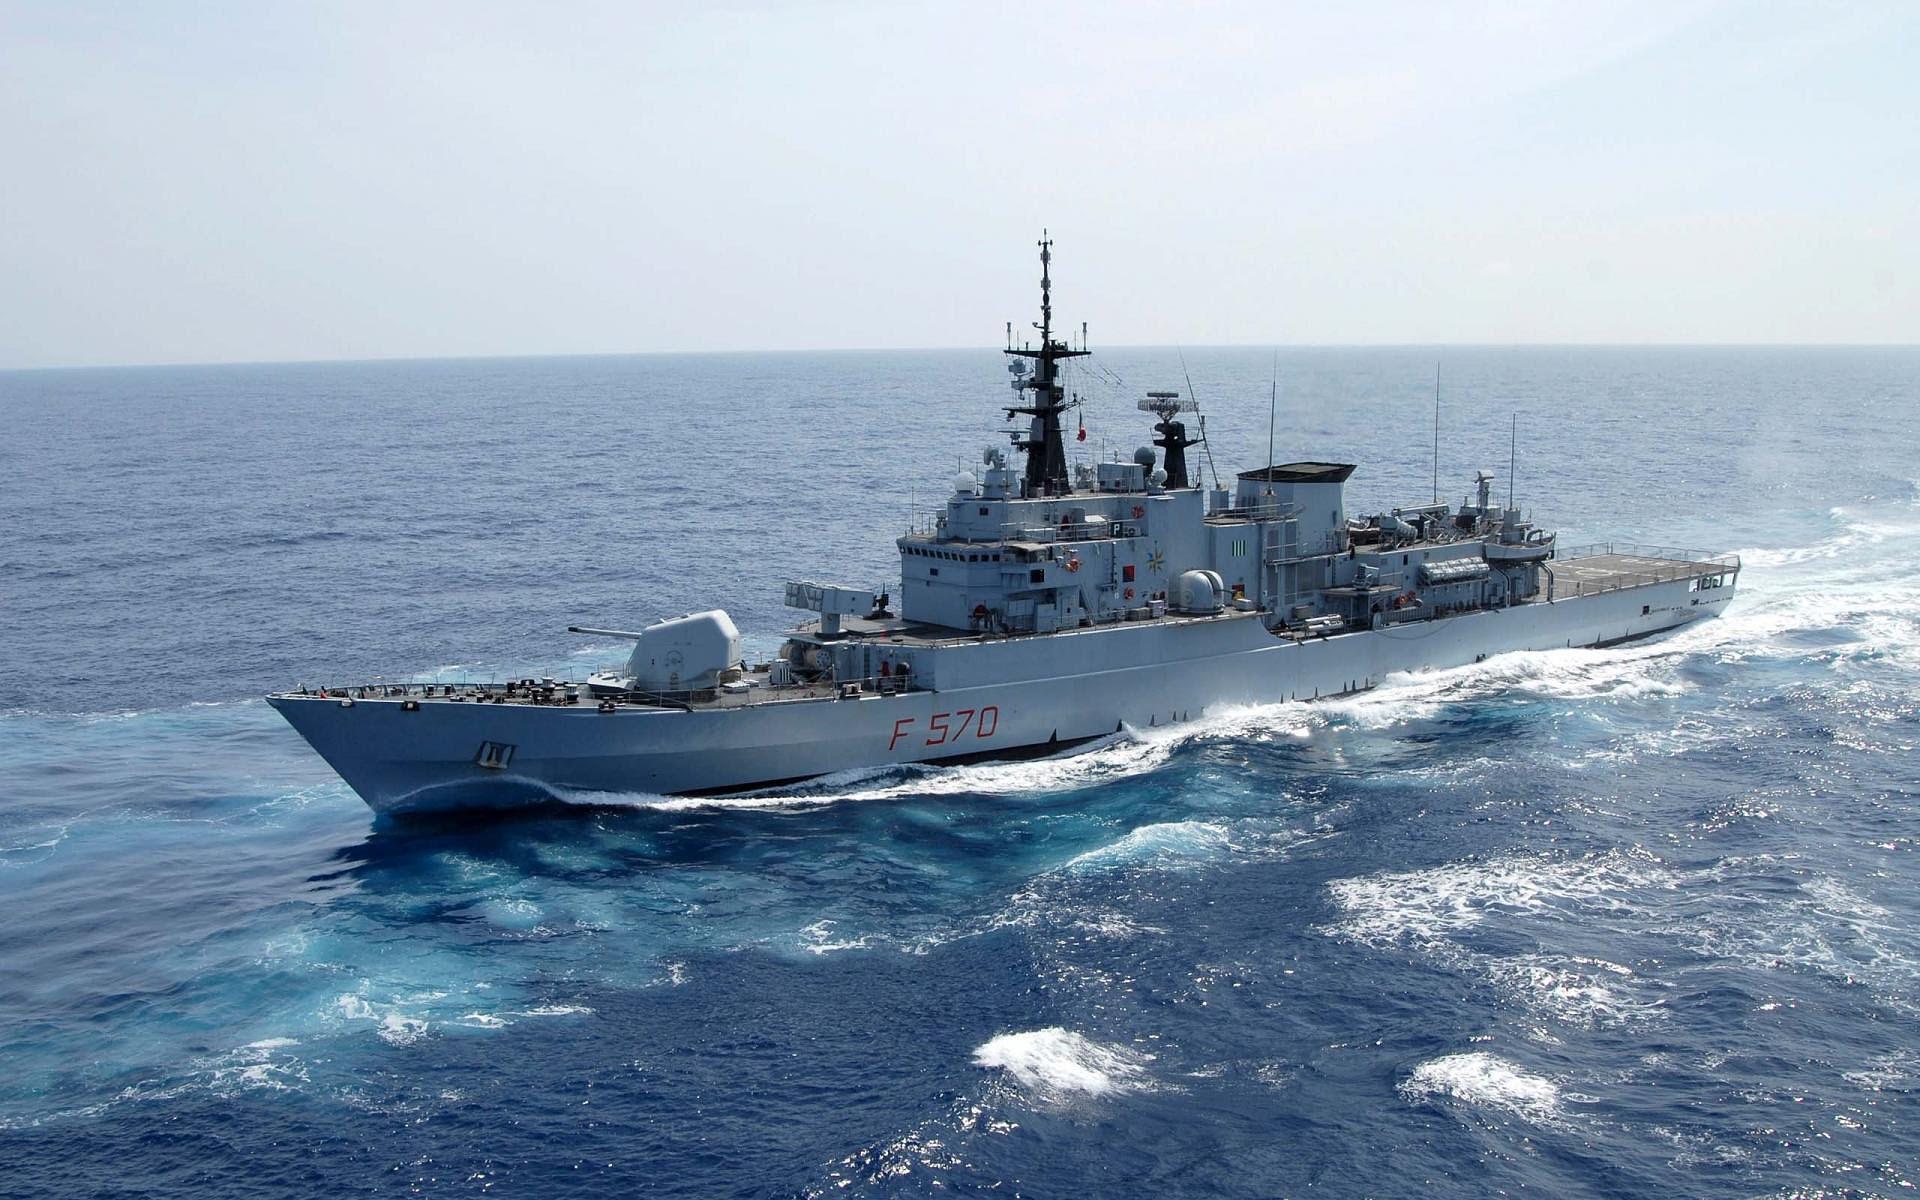 Militar - Italian Frigate ITS Maestrale (F570)  Fondo de Pantalla